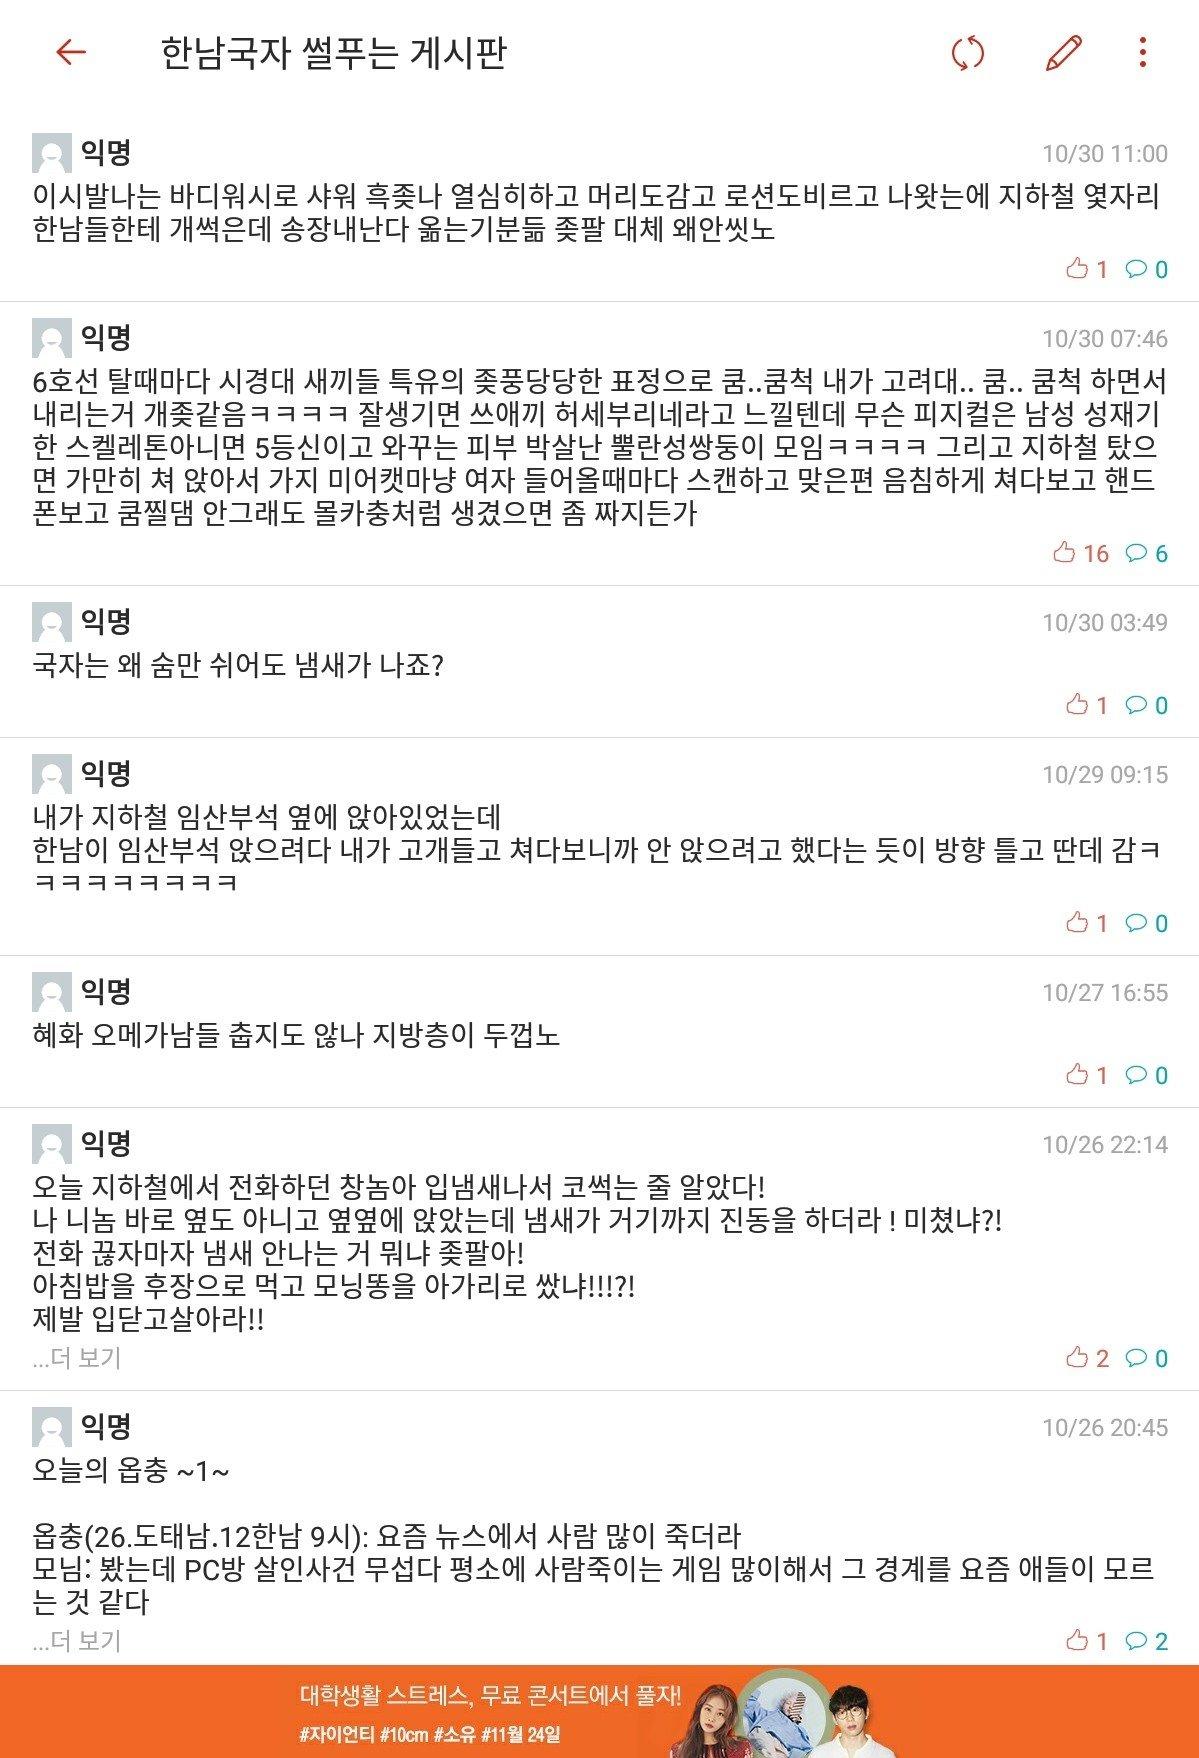 Screenshot_2018-10-31-14-14-07-973.jpeg (혐오)동덕여대 에타 게시판